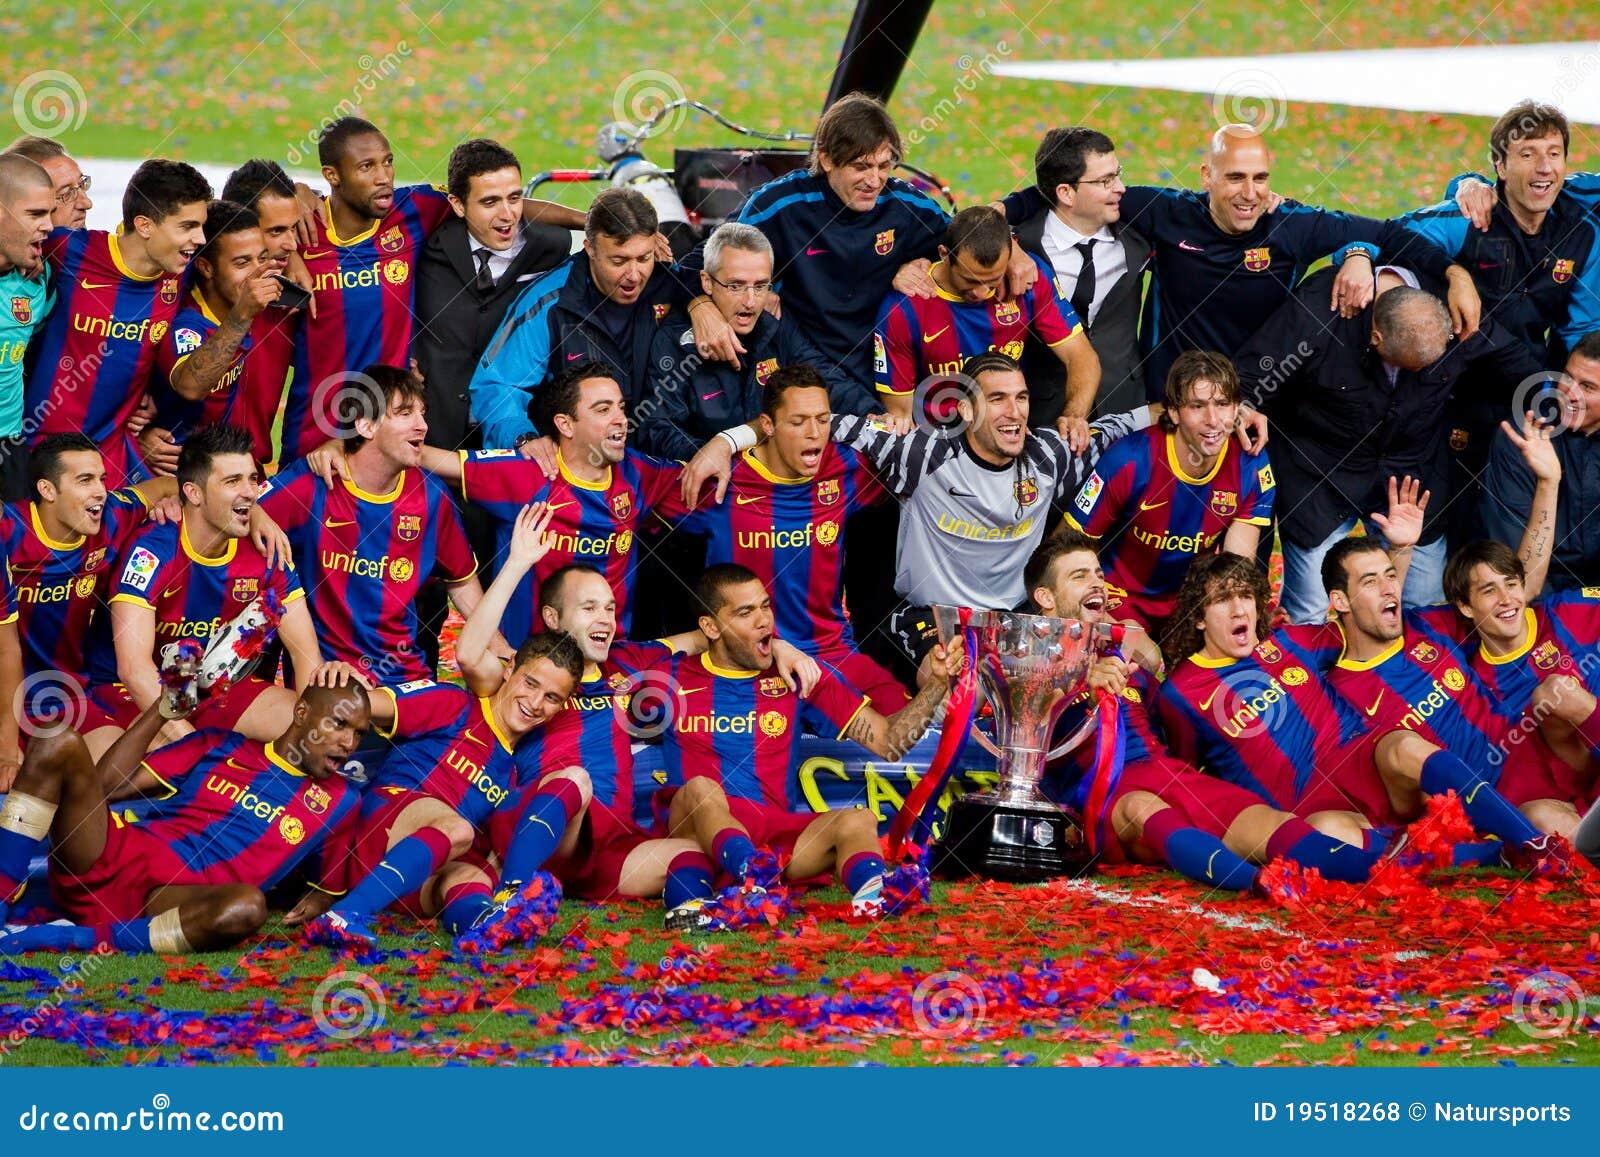 FC Barcelona players celebrating the League